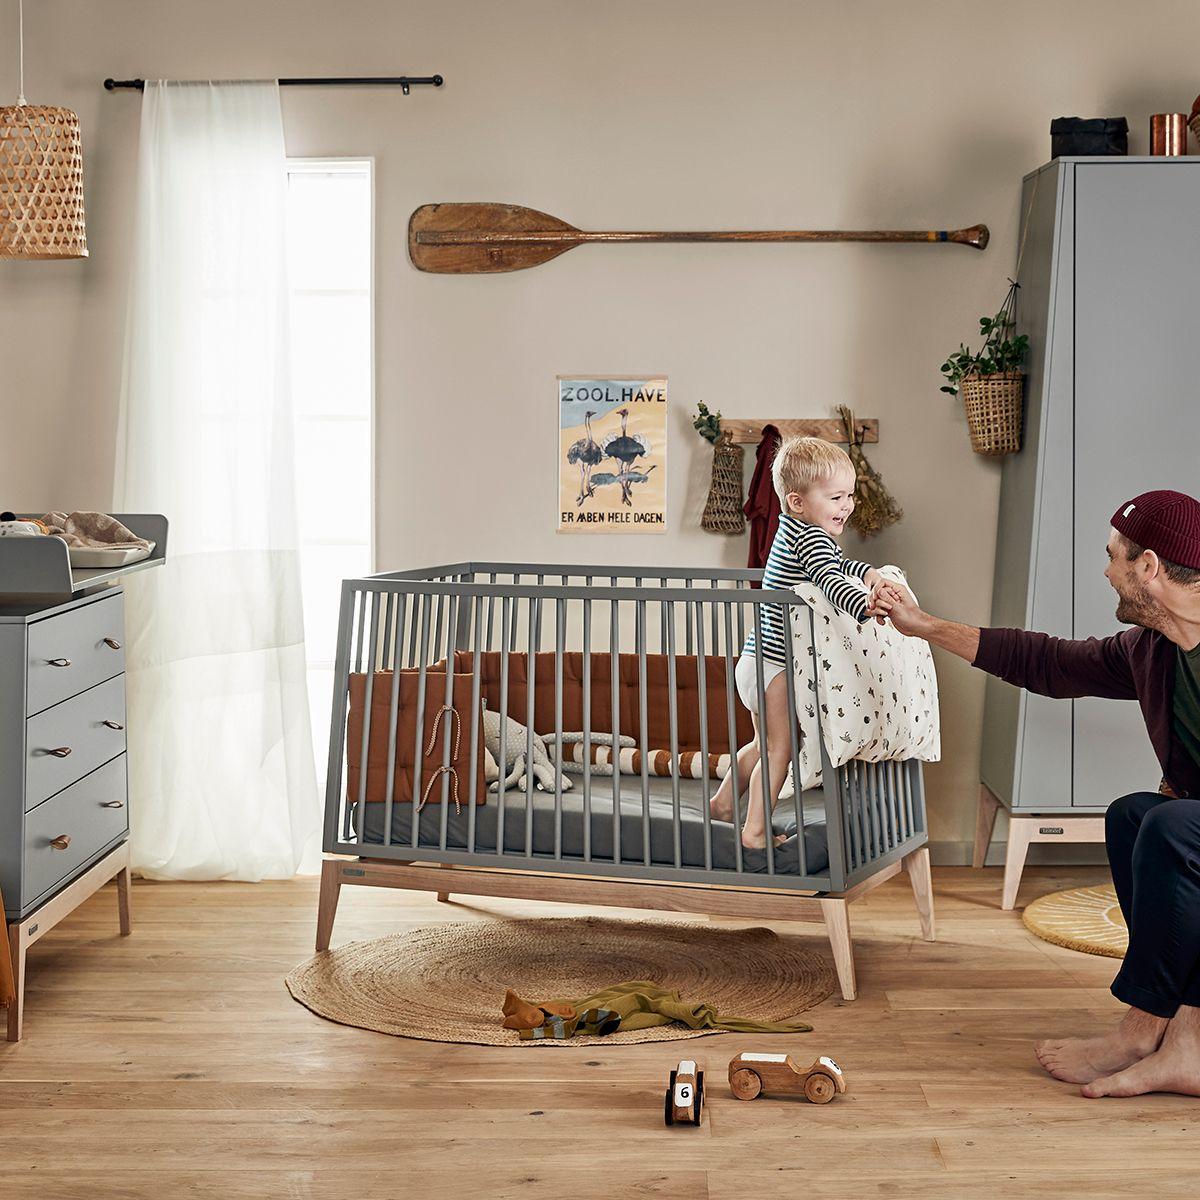 Leander Luna Gitterbett in Berlin kaufen - Kleine Fabriek